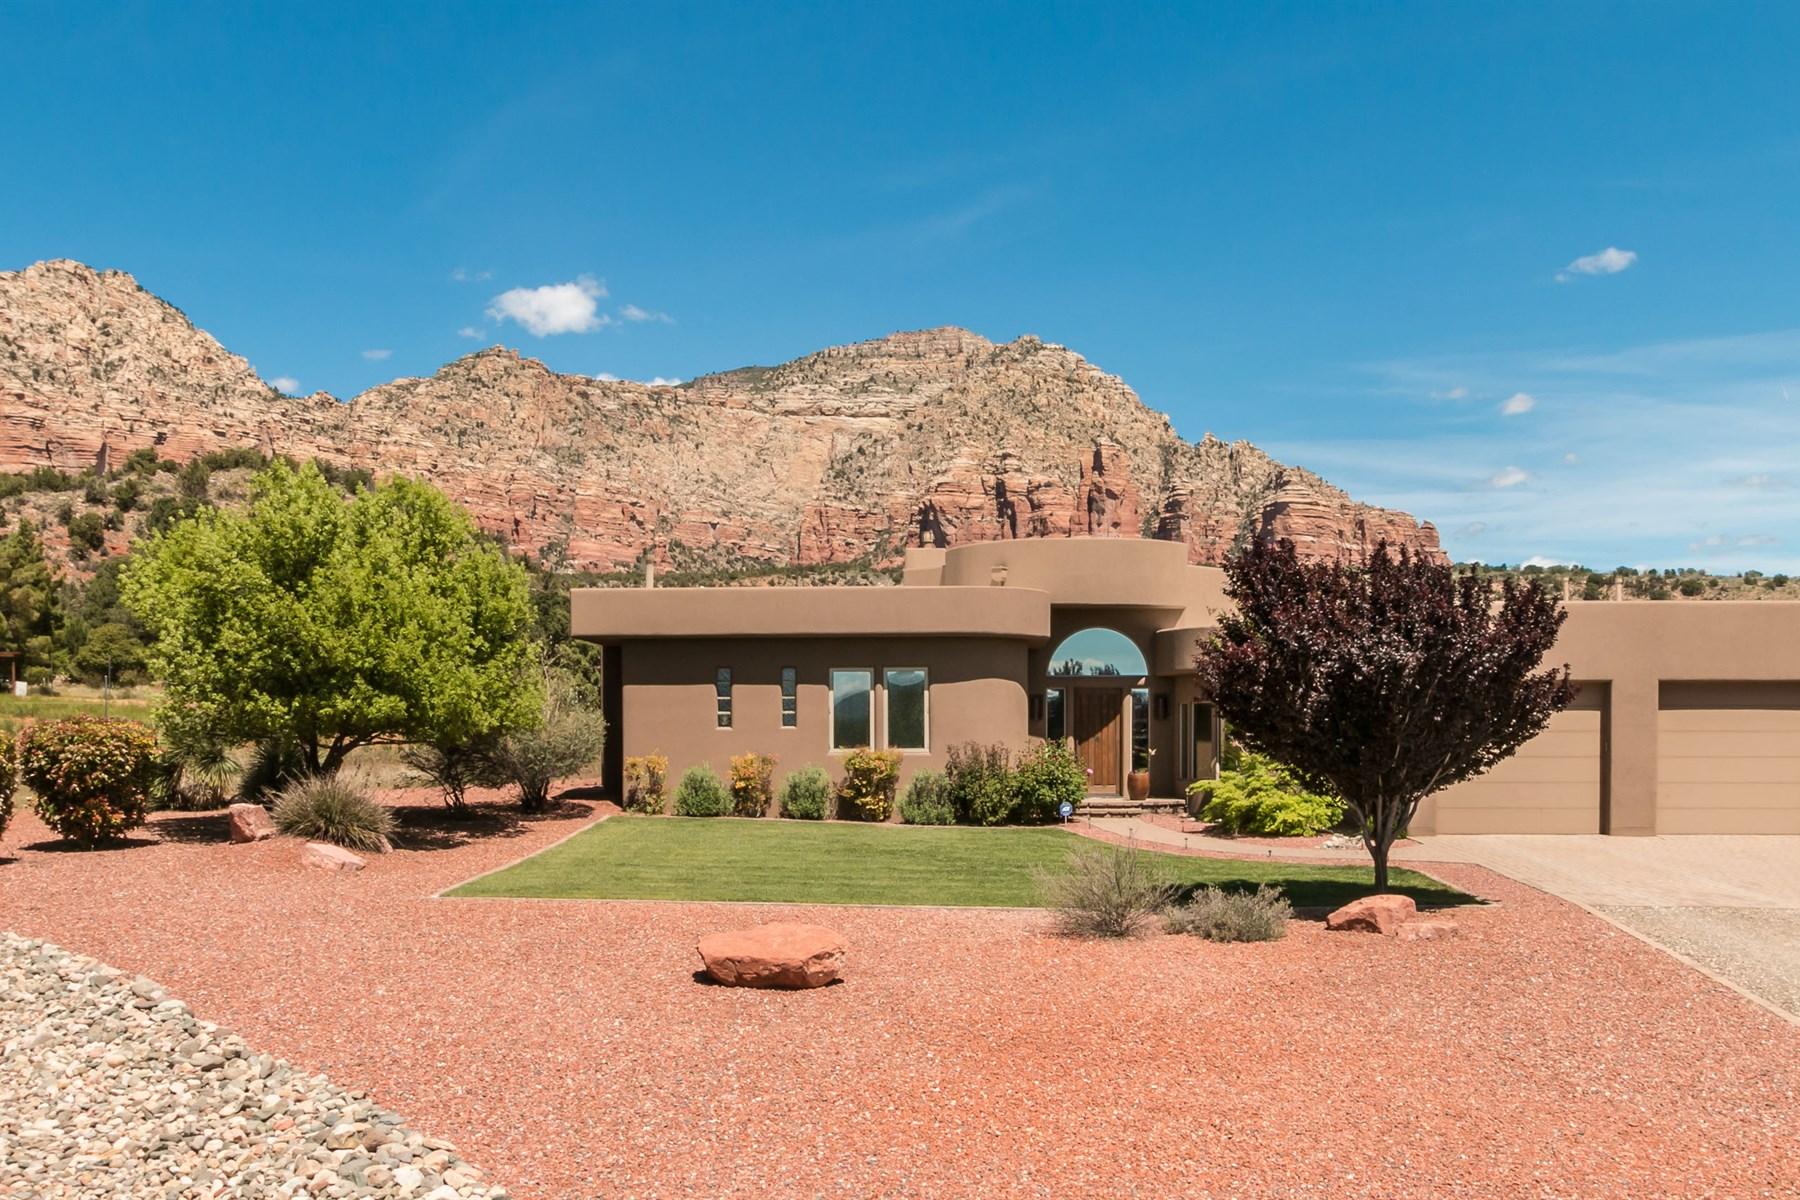 Single Family Home for Sale at Southwestern with a modern flair 90 Sunbeam Acres Lane Sedona, Arizona, 86351 United States